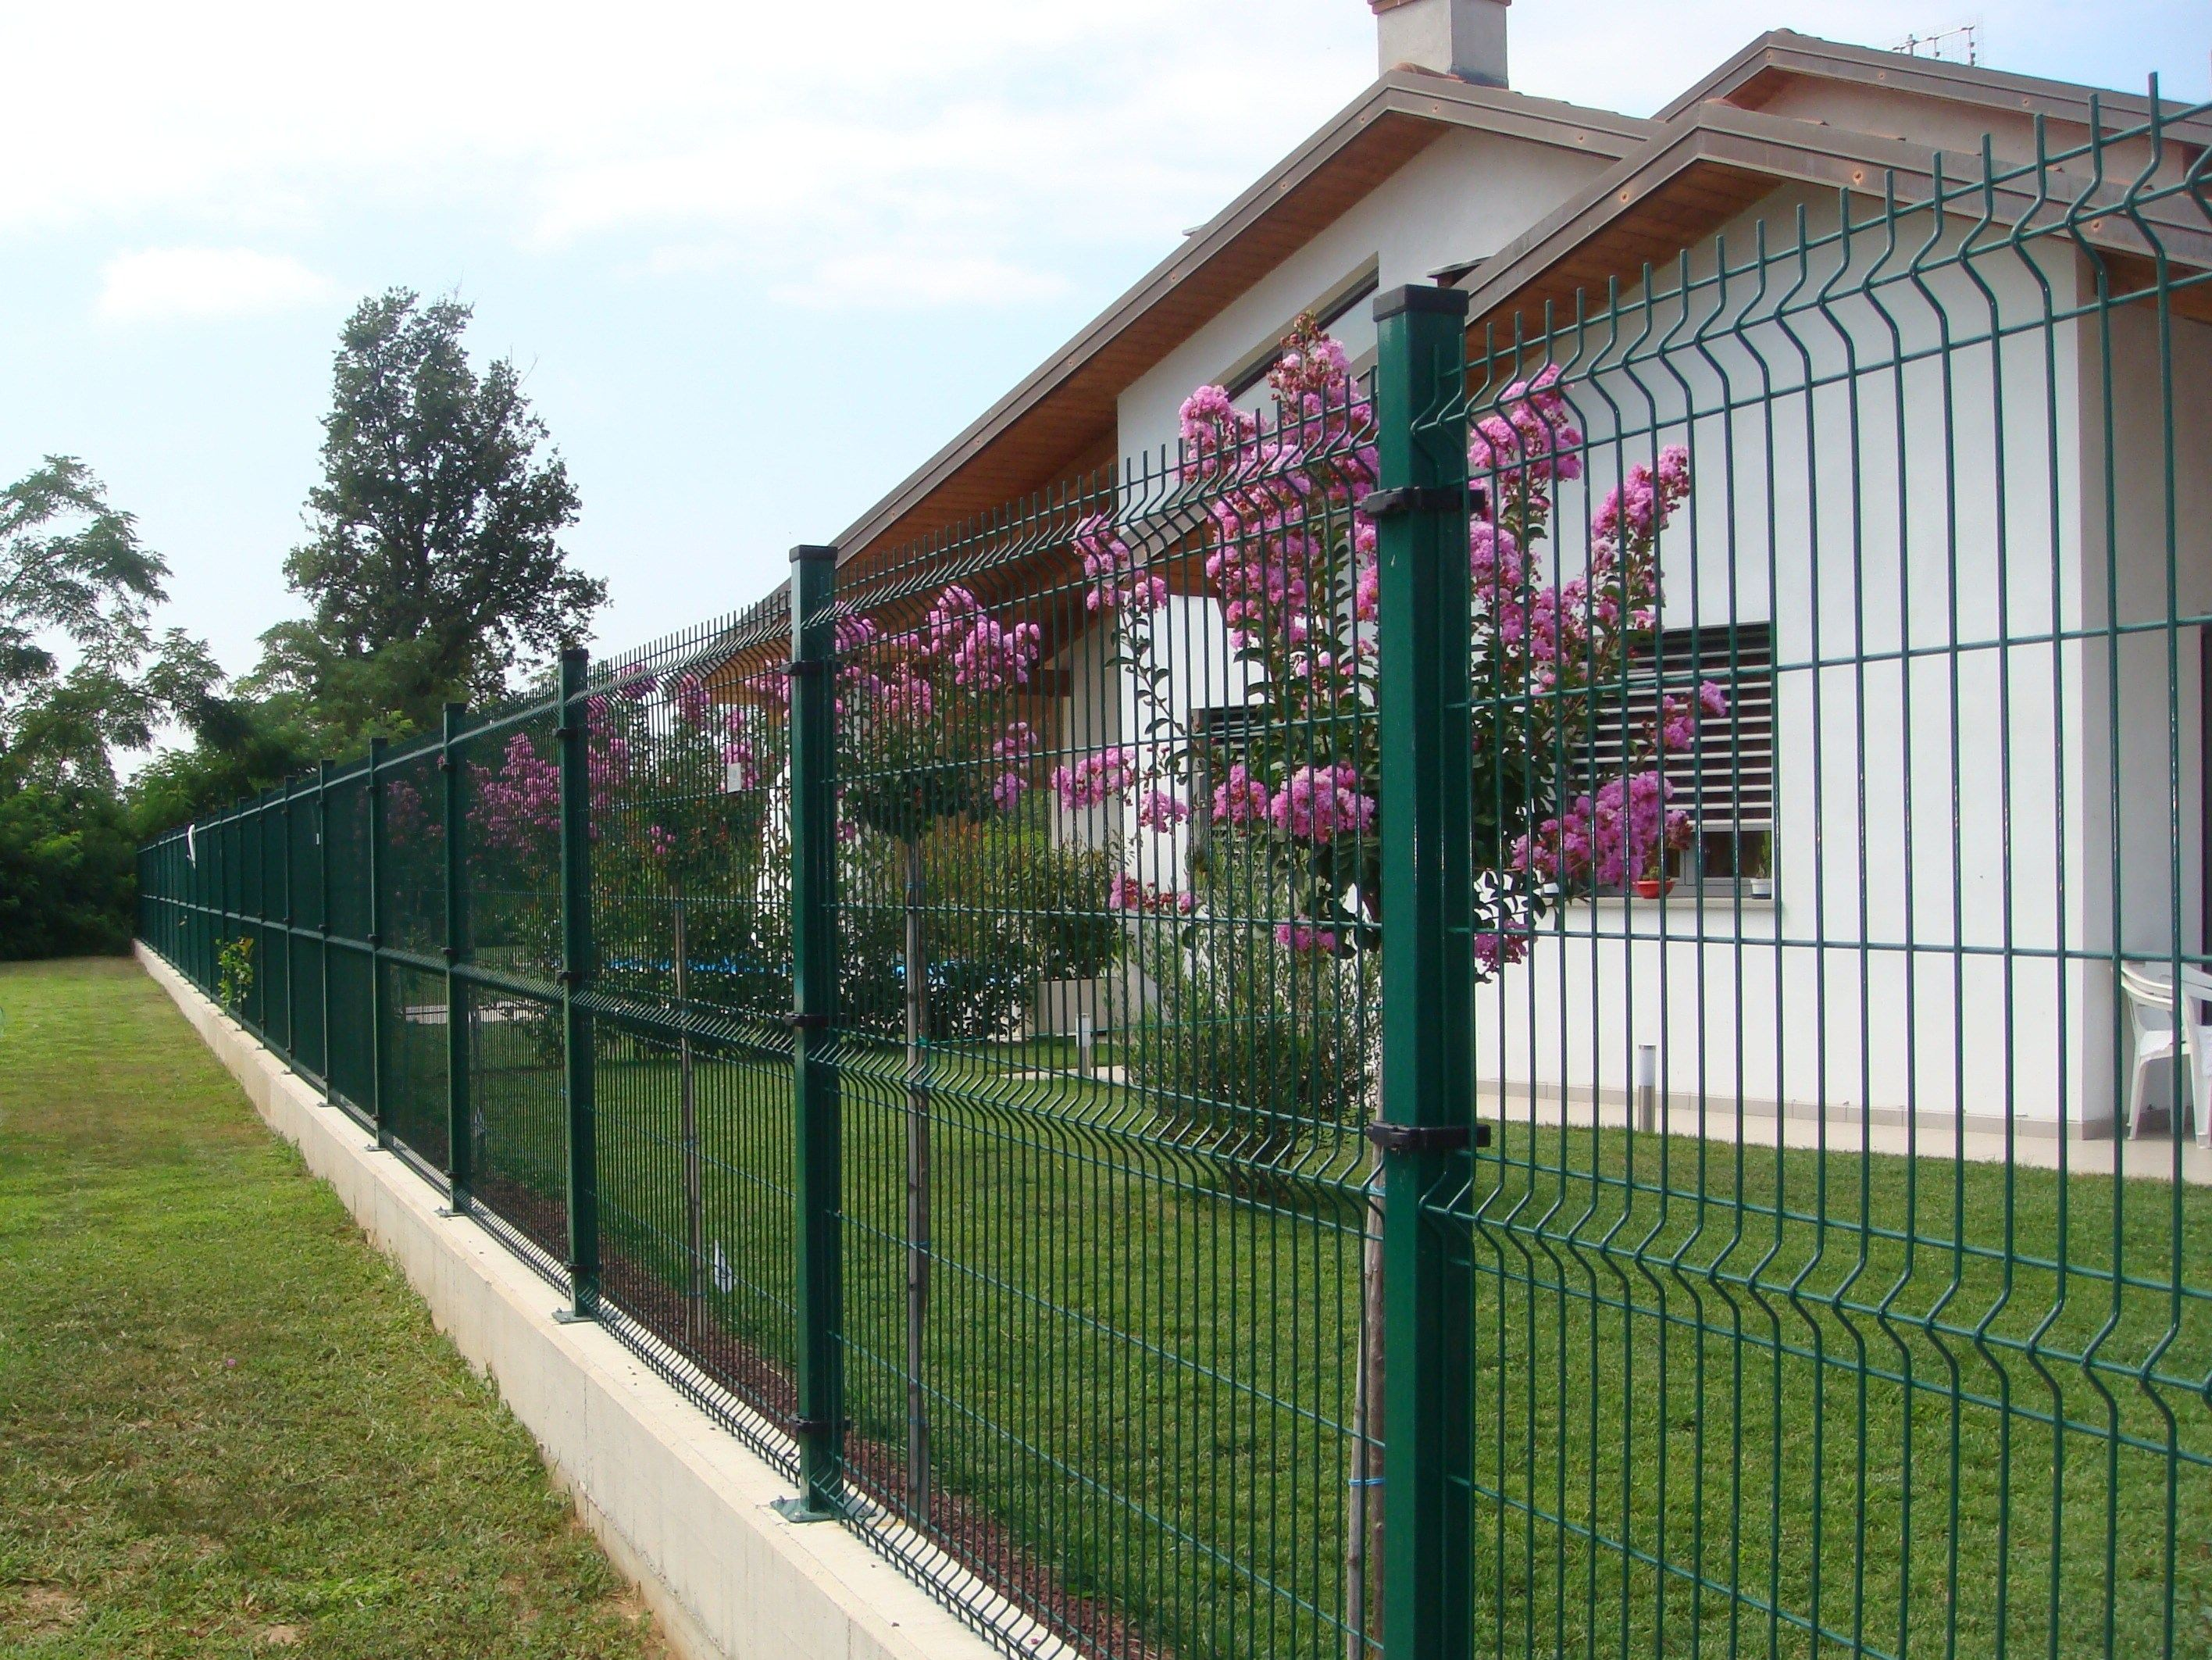 Recinzione in rete elettrosaldata recintha n l by nuova defim for Rete recinzione leroy merlin